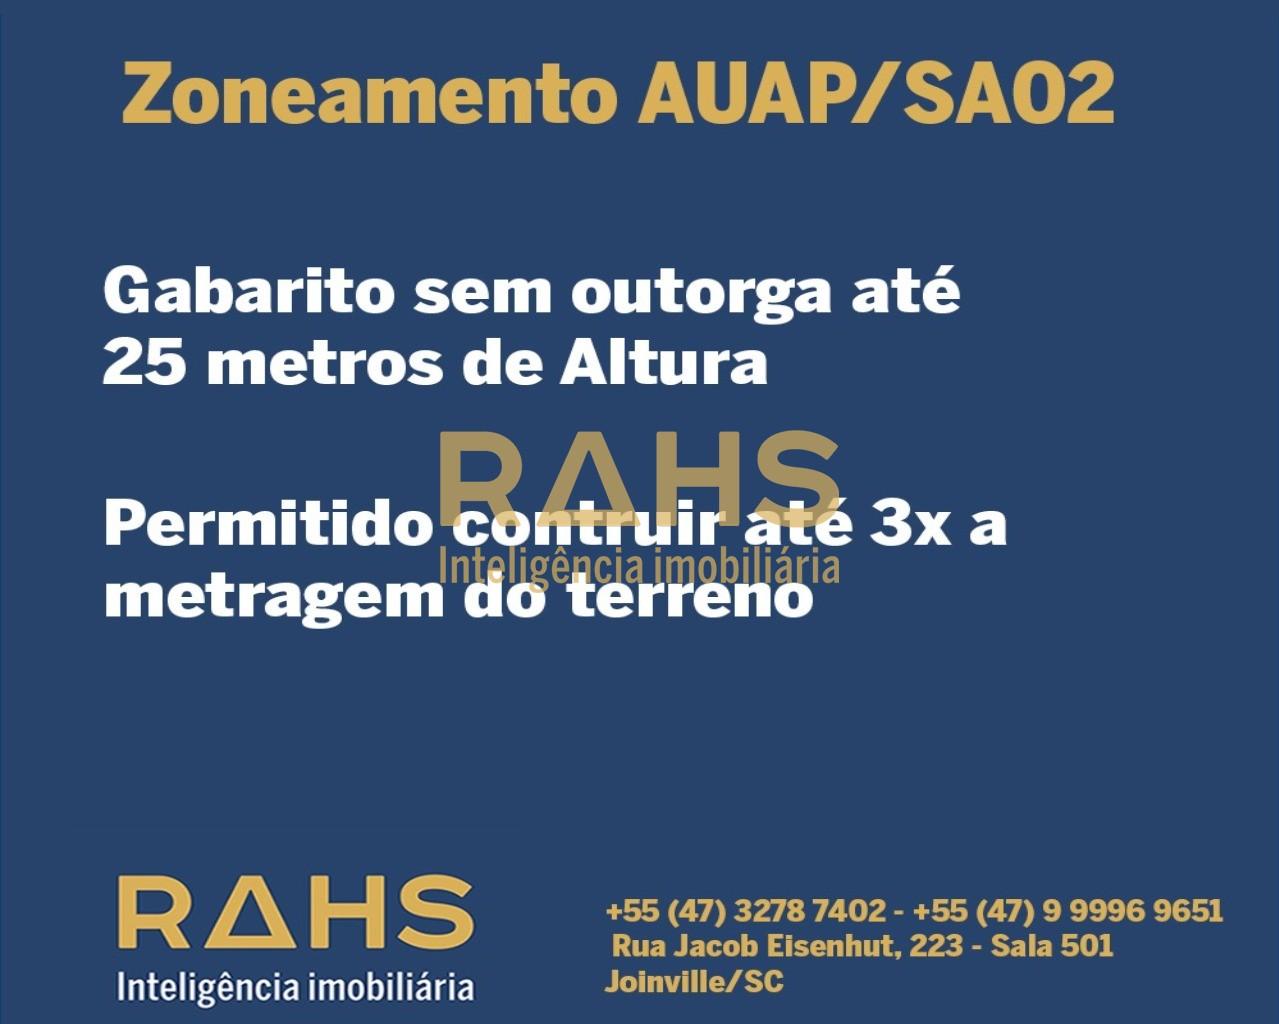 https://s3-sa-east-1.amazonaws.com/grupo-union/20655/2021/09/be0cb90d33cbc83a2c76fbfe8e3eddca.jpg